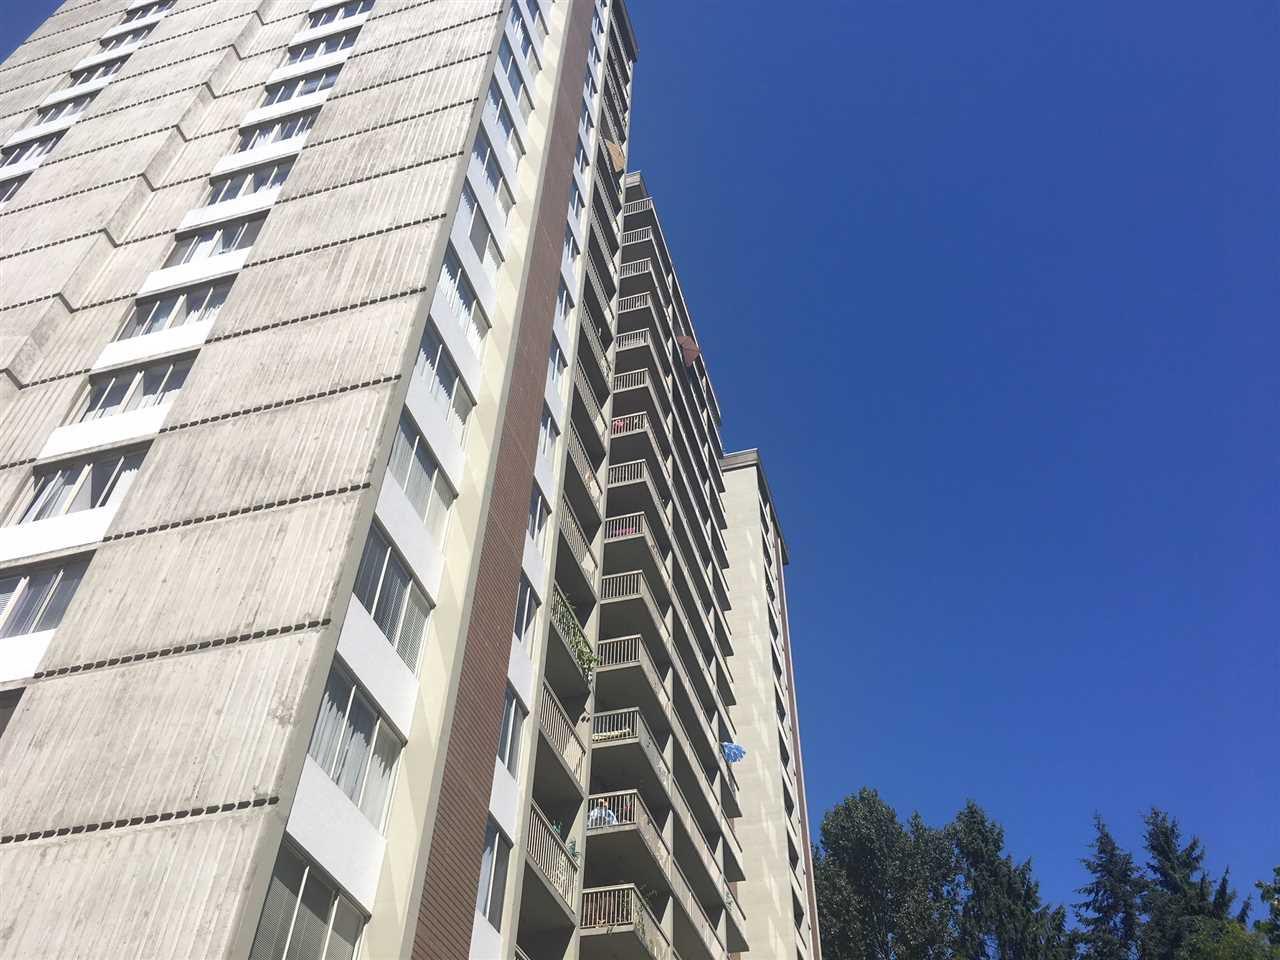 "Main Photo: 905 2008 FULLERTON Avenue in North Vancouver: Pemberton NV Condo for sale in ""WOODCROFT ESTATES"" : MLS®# R2295475"